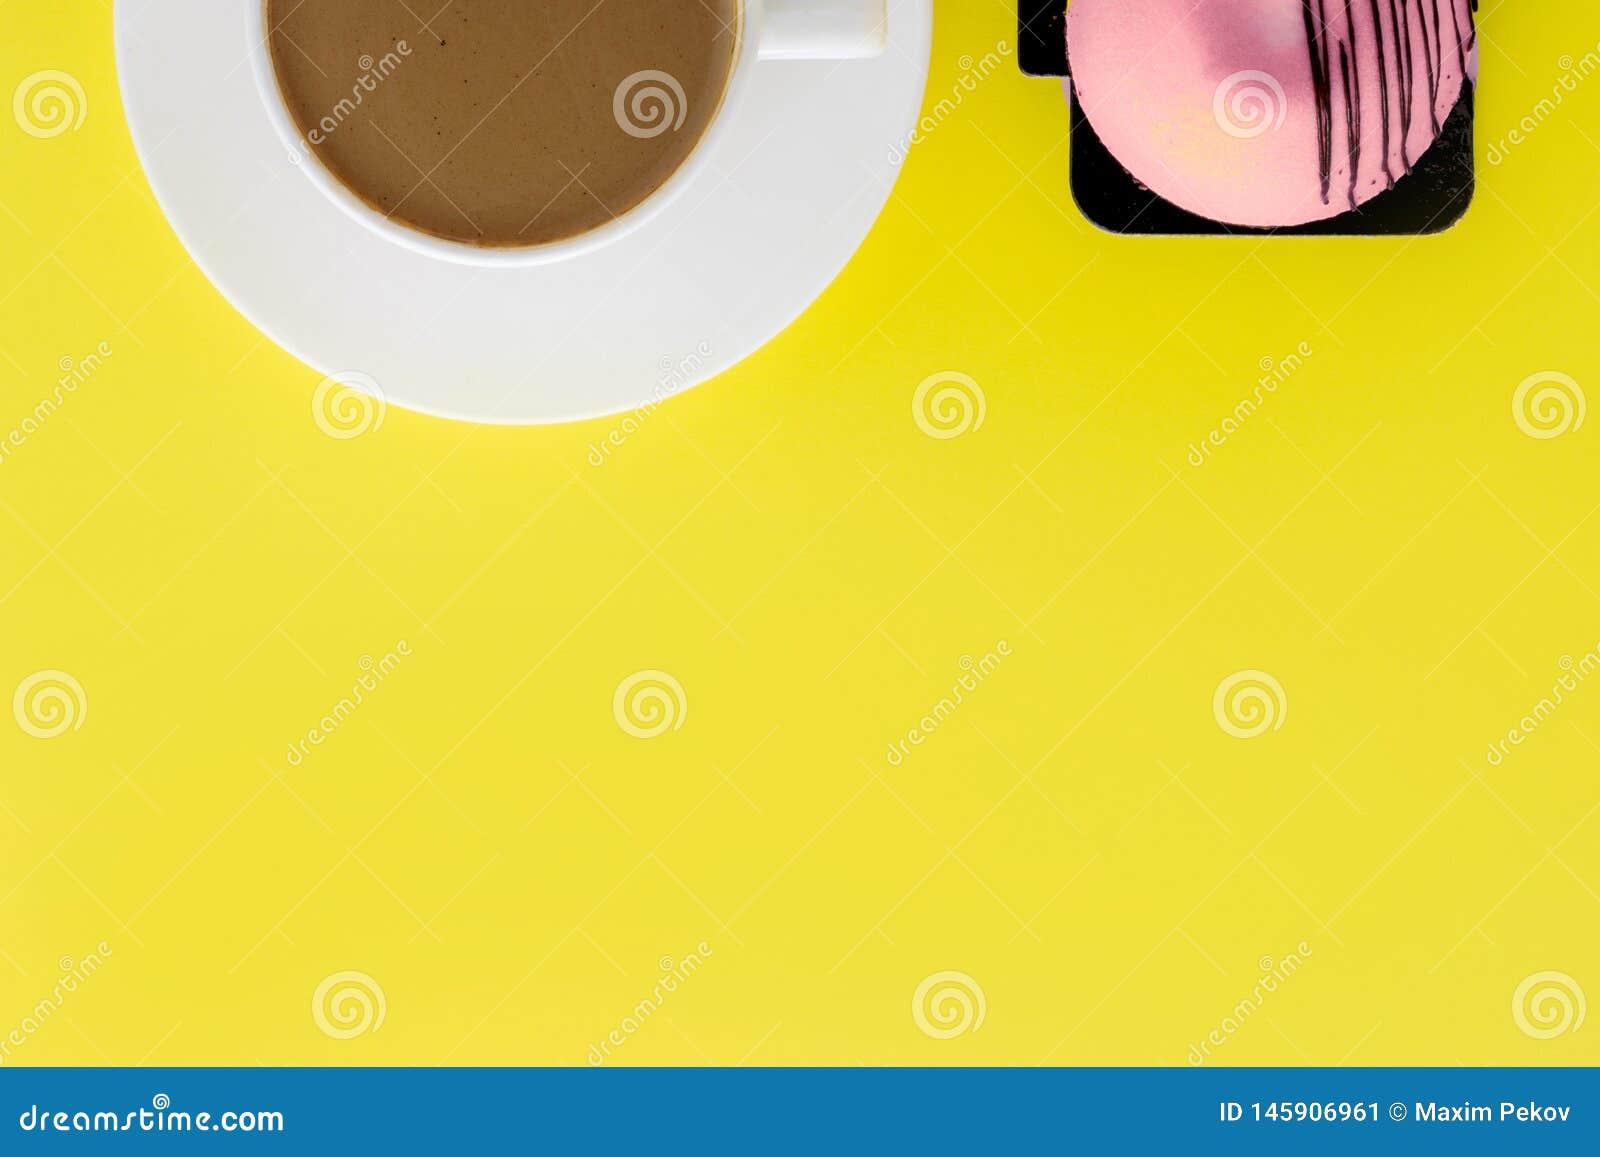 Wei?e Schale des hei?en Kaffees und des s??en Kuchens